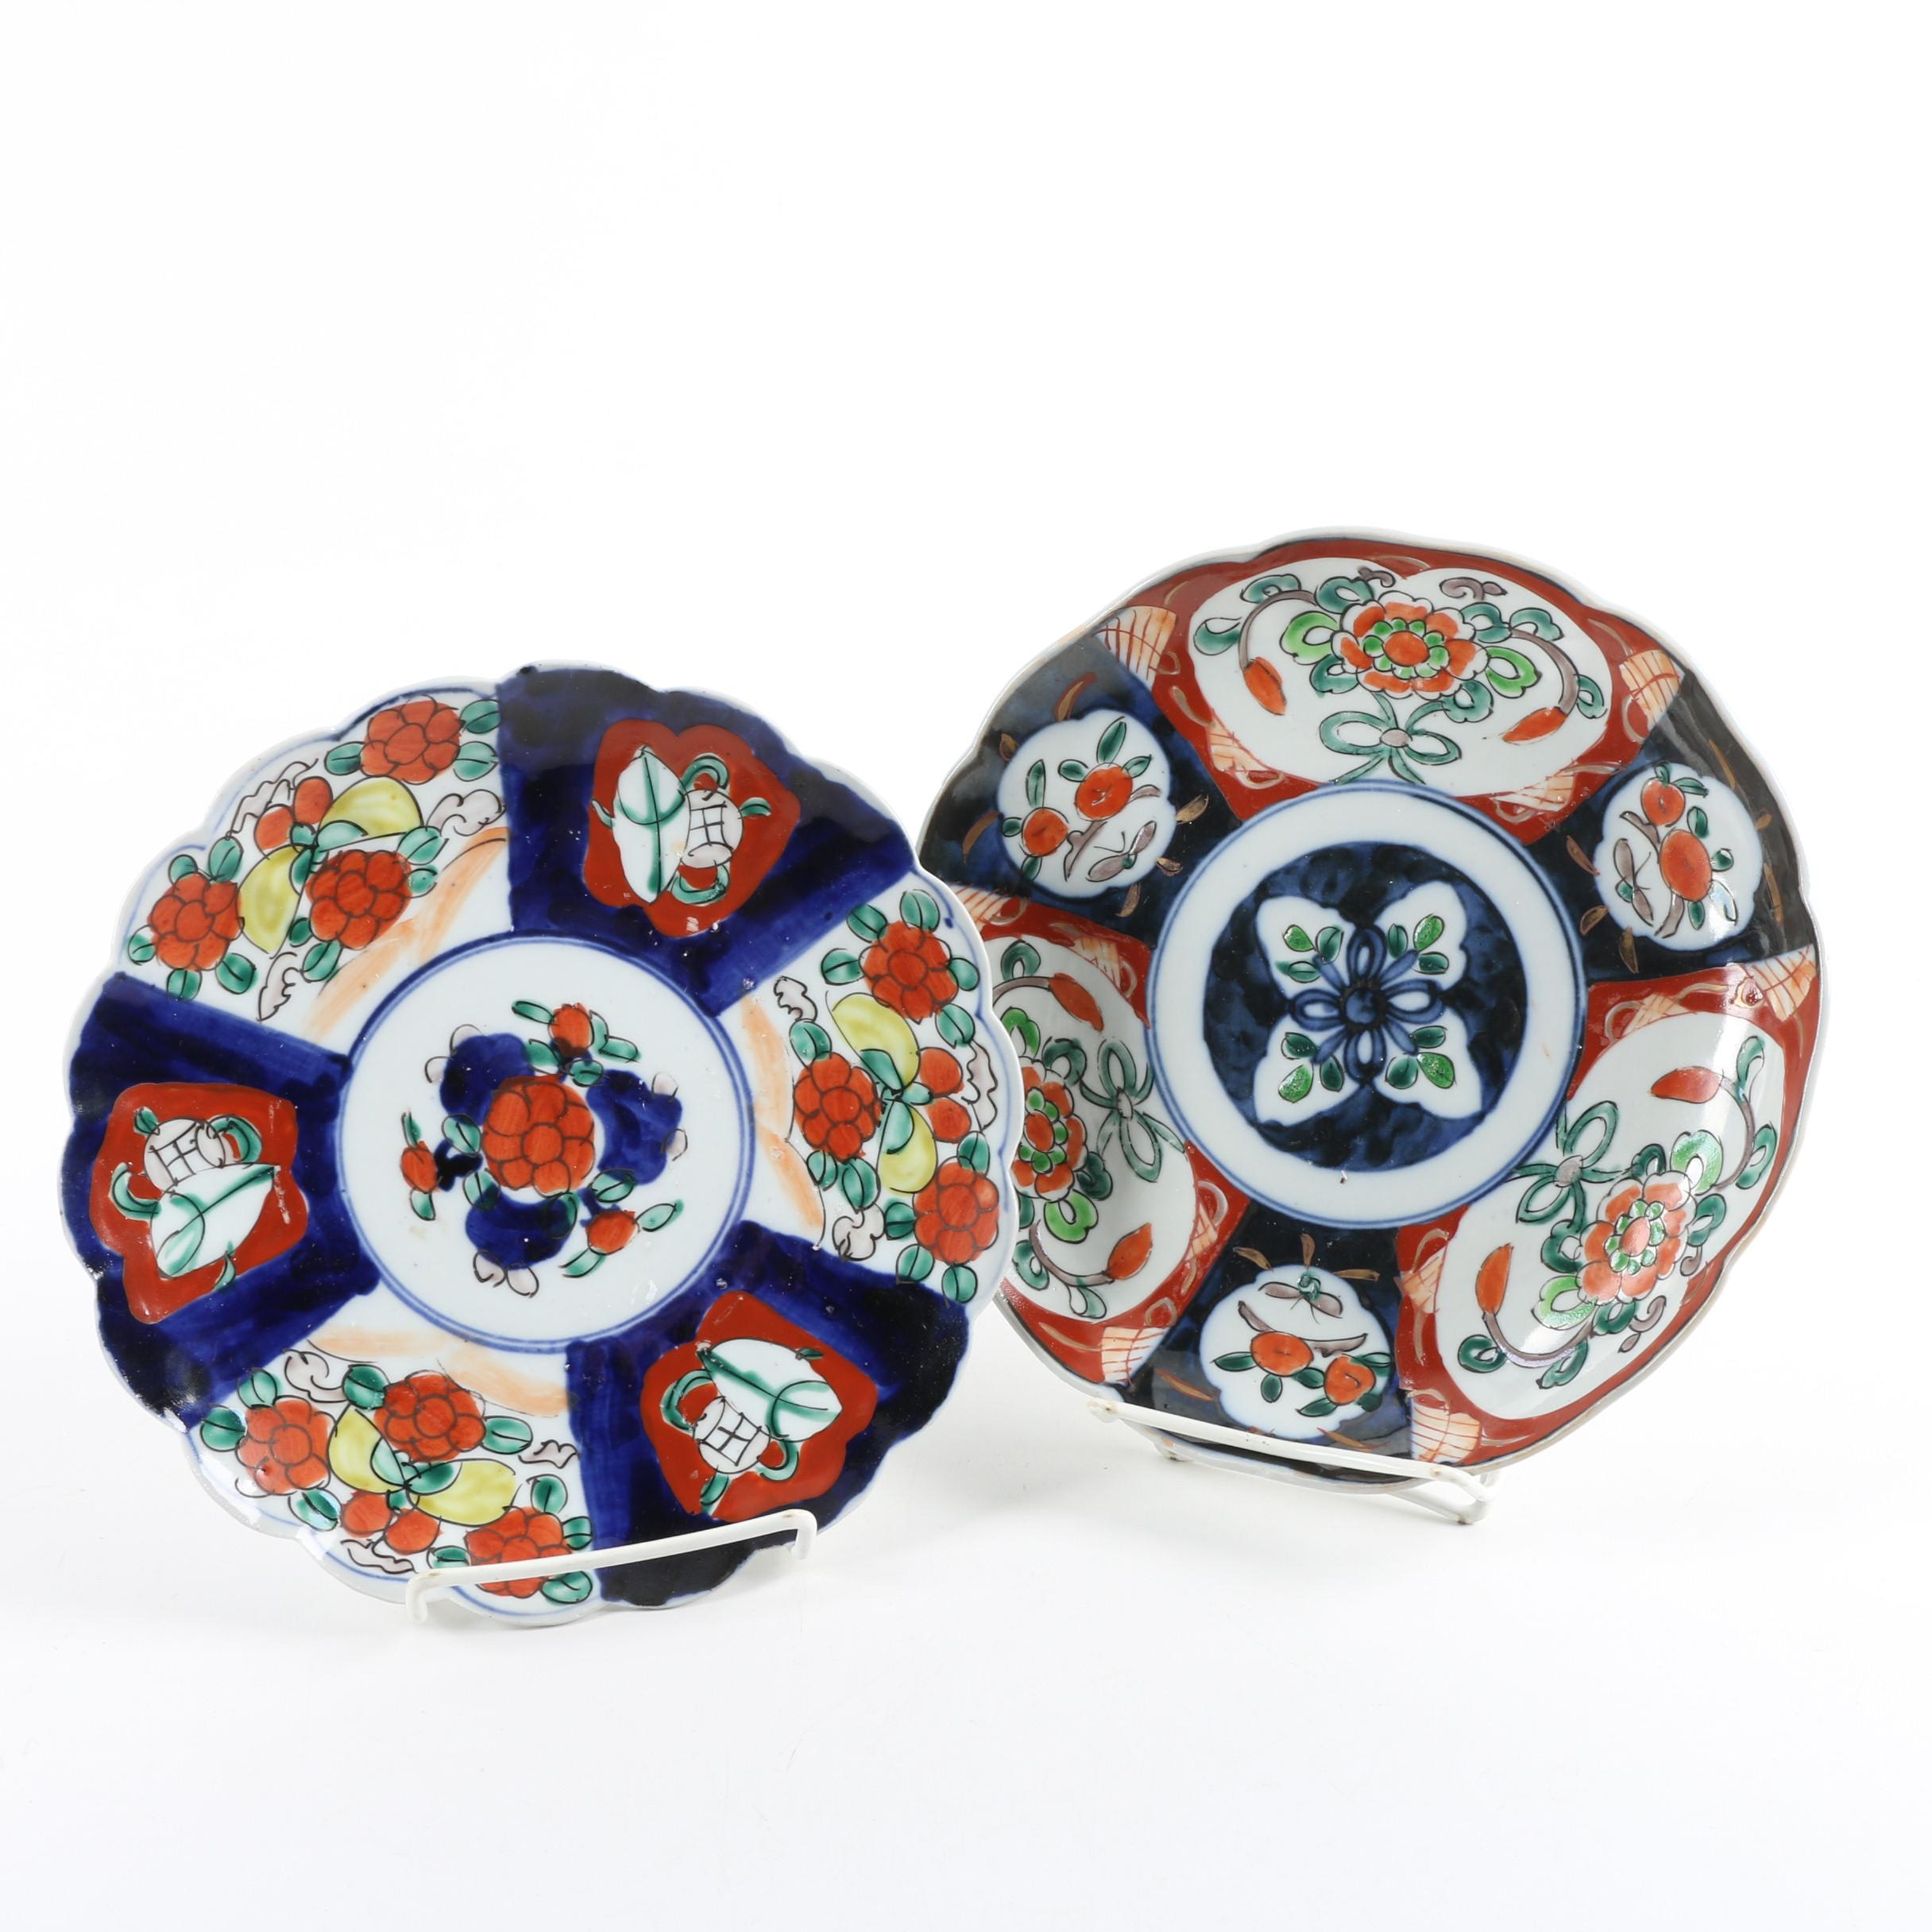 Vintage Hand-Painted Japanese Imari Porcelain Plates